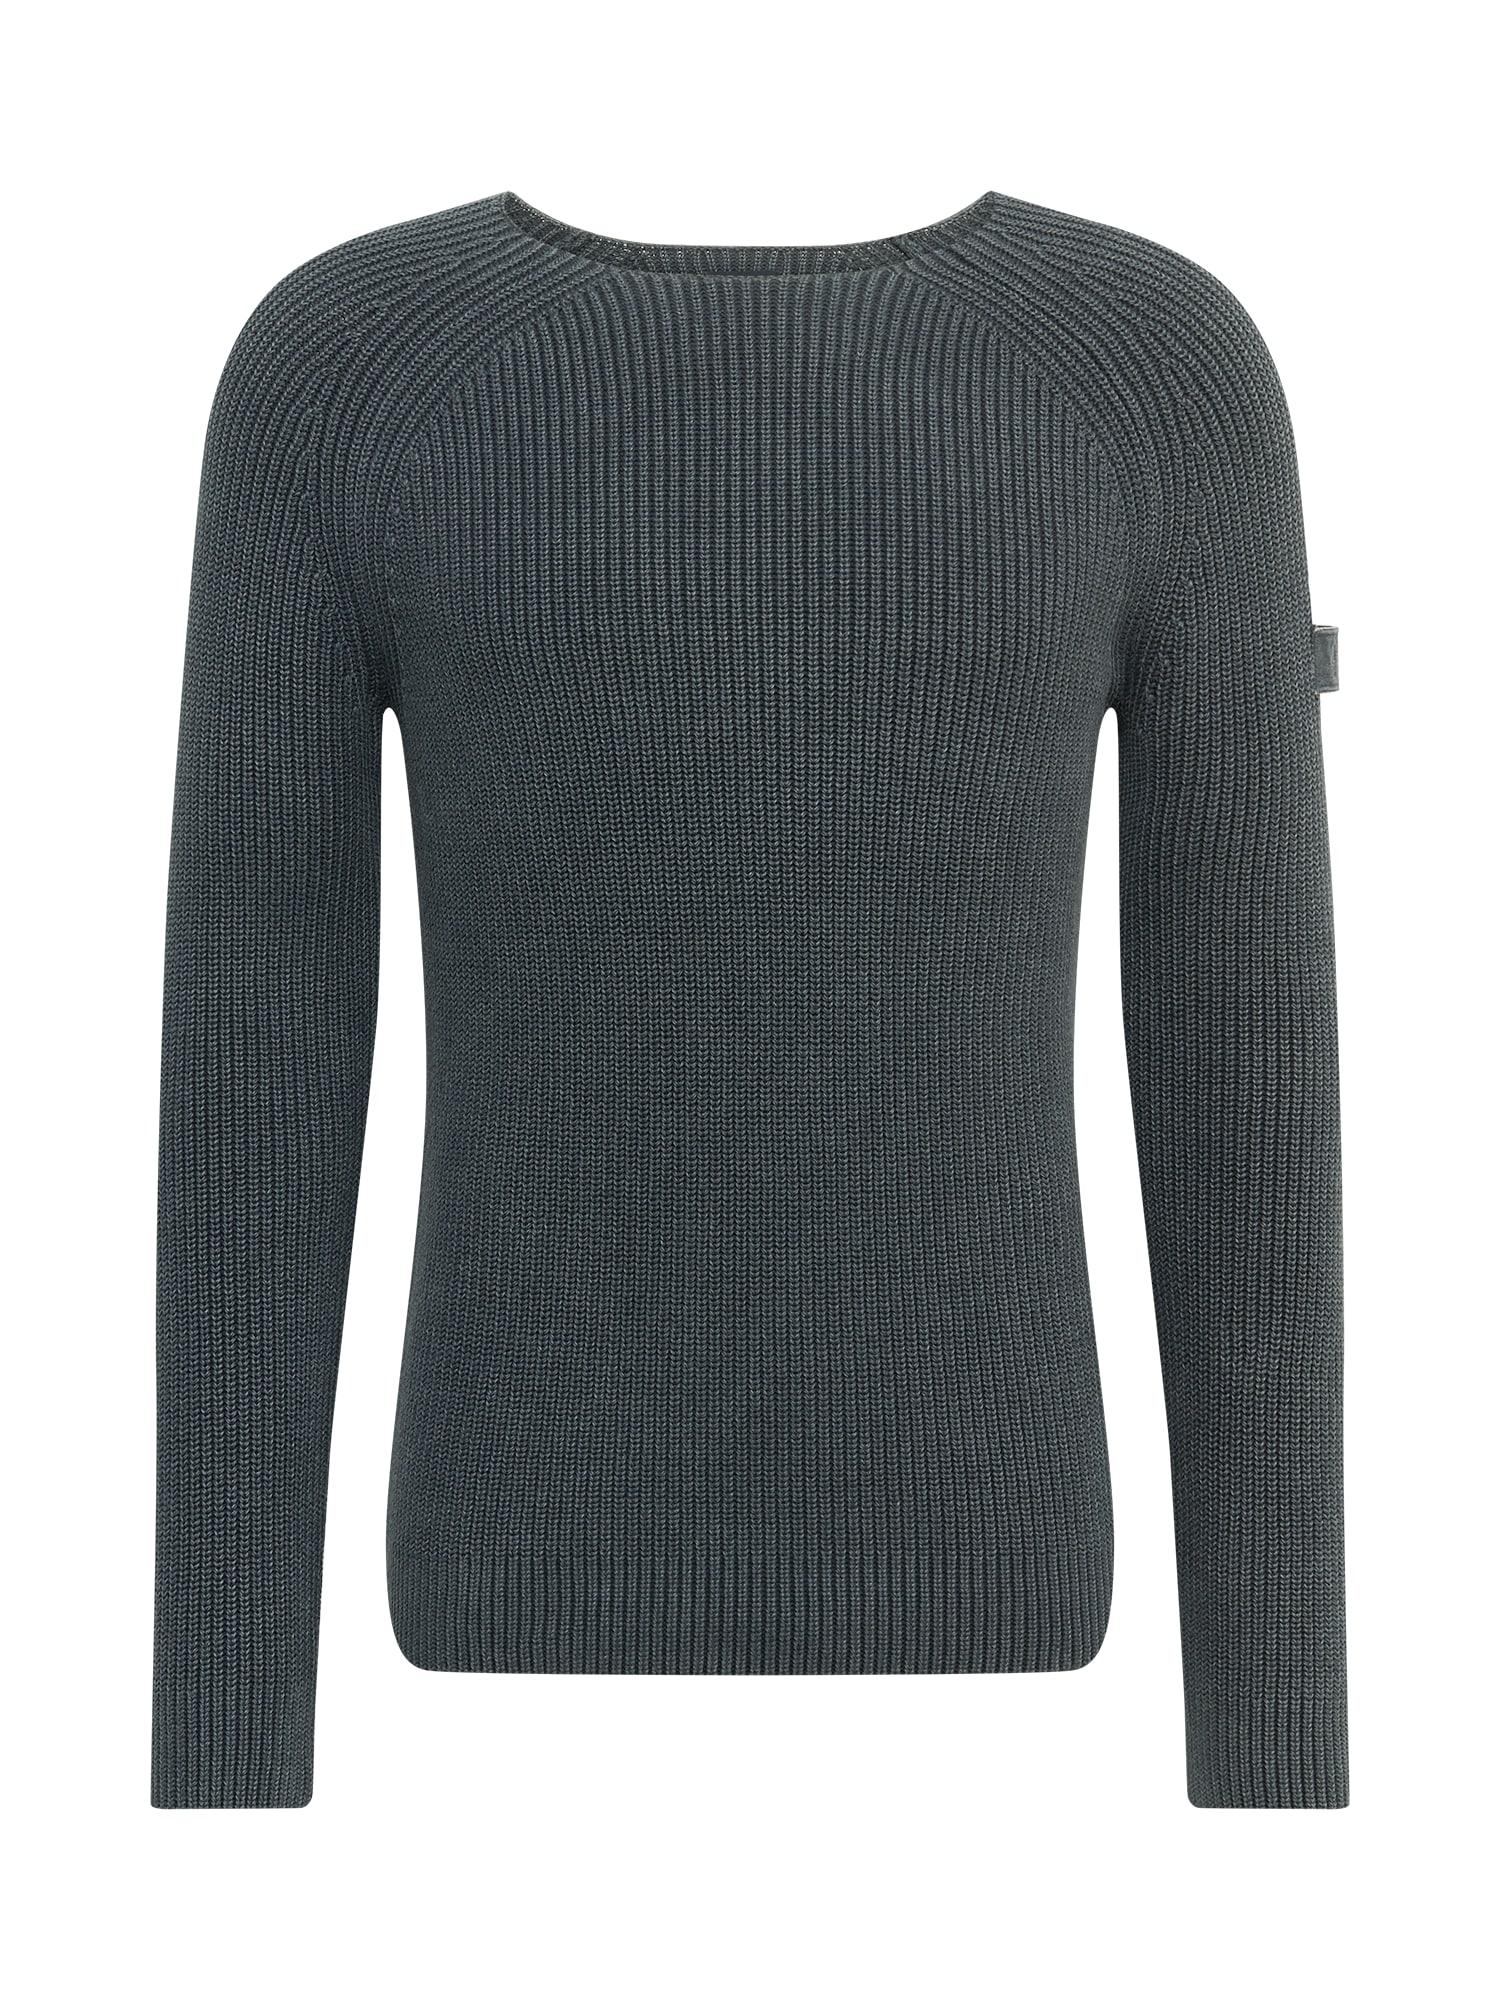 JOOP! Jeans Megztinis tamsiai mėlyna